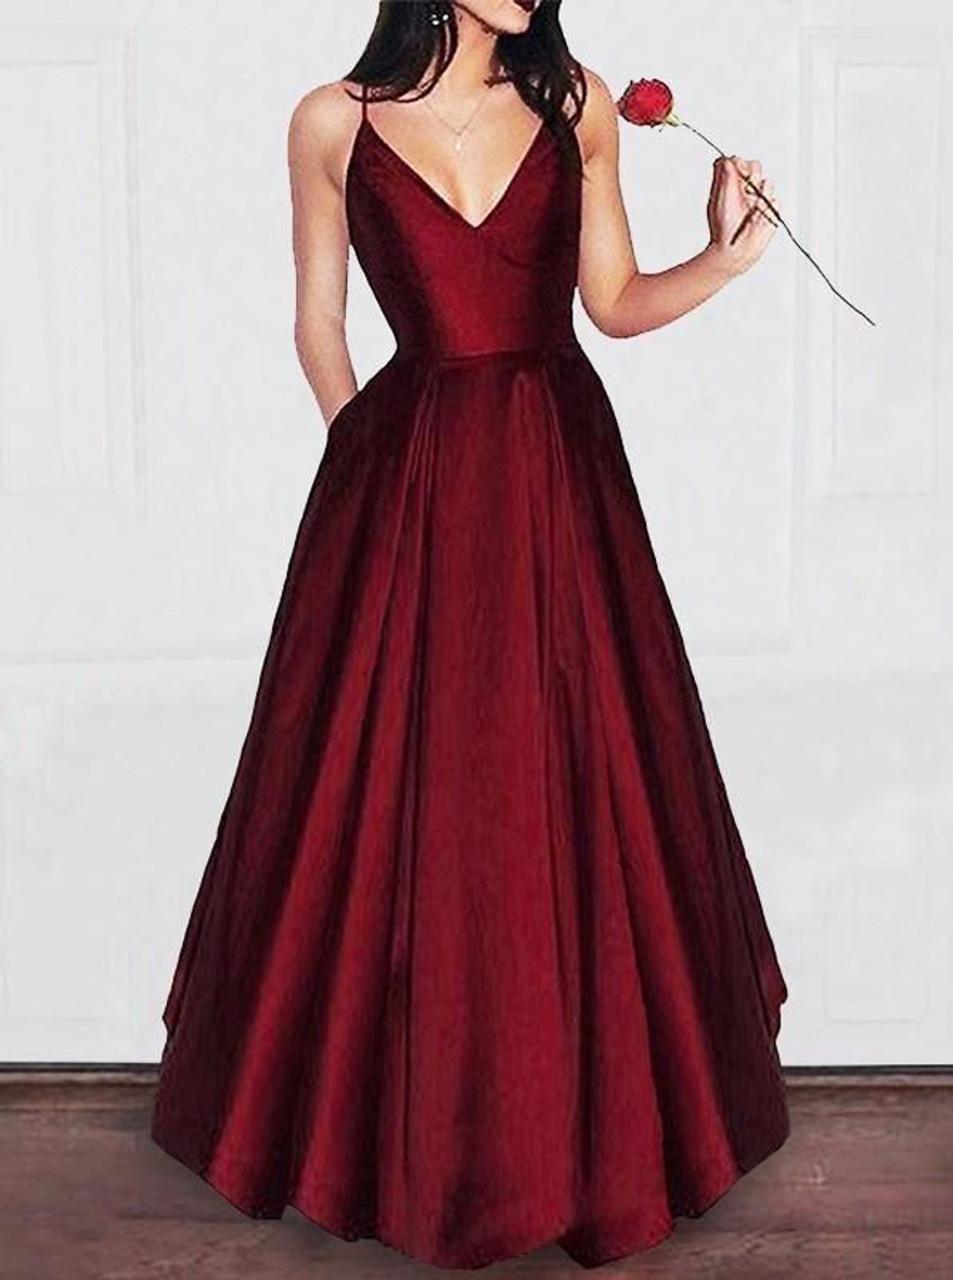 1606880cef5 Burgundy Simple Prom Dresses